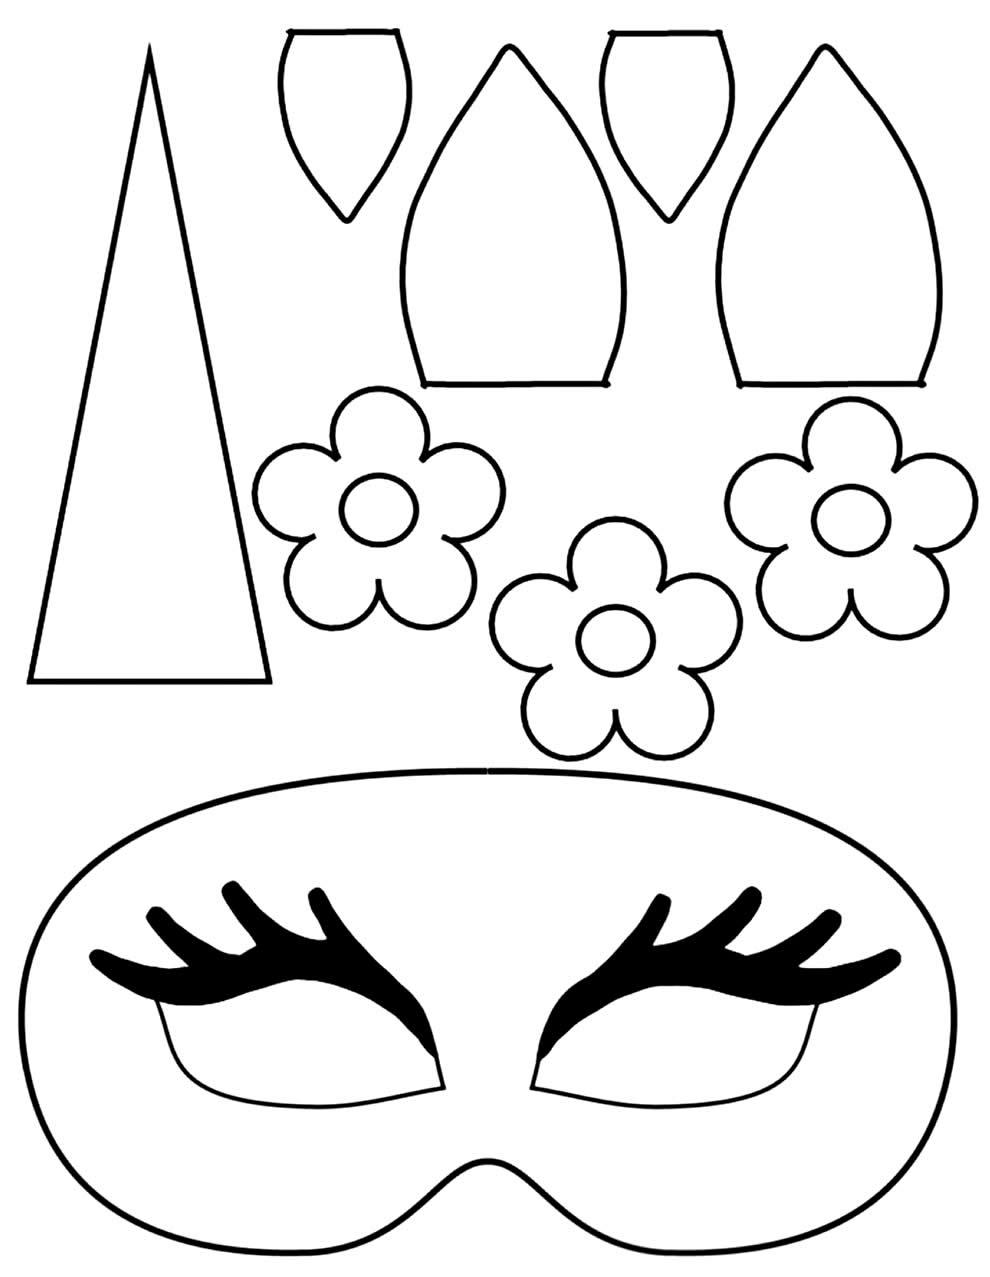 Moldes de máscaras de unicórnio para imprimir